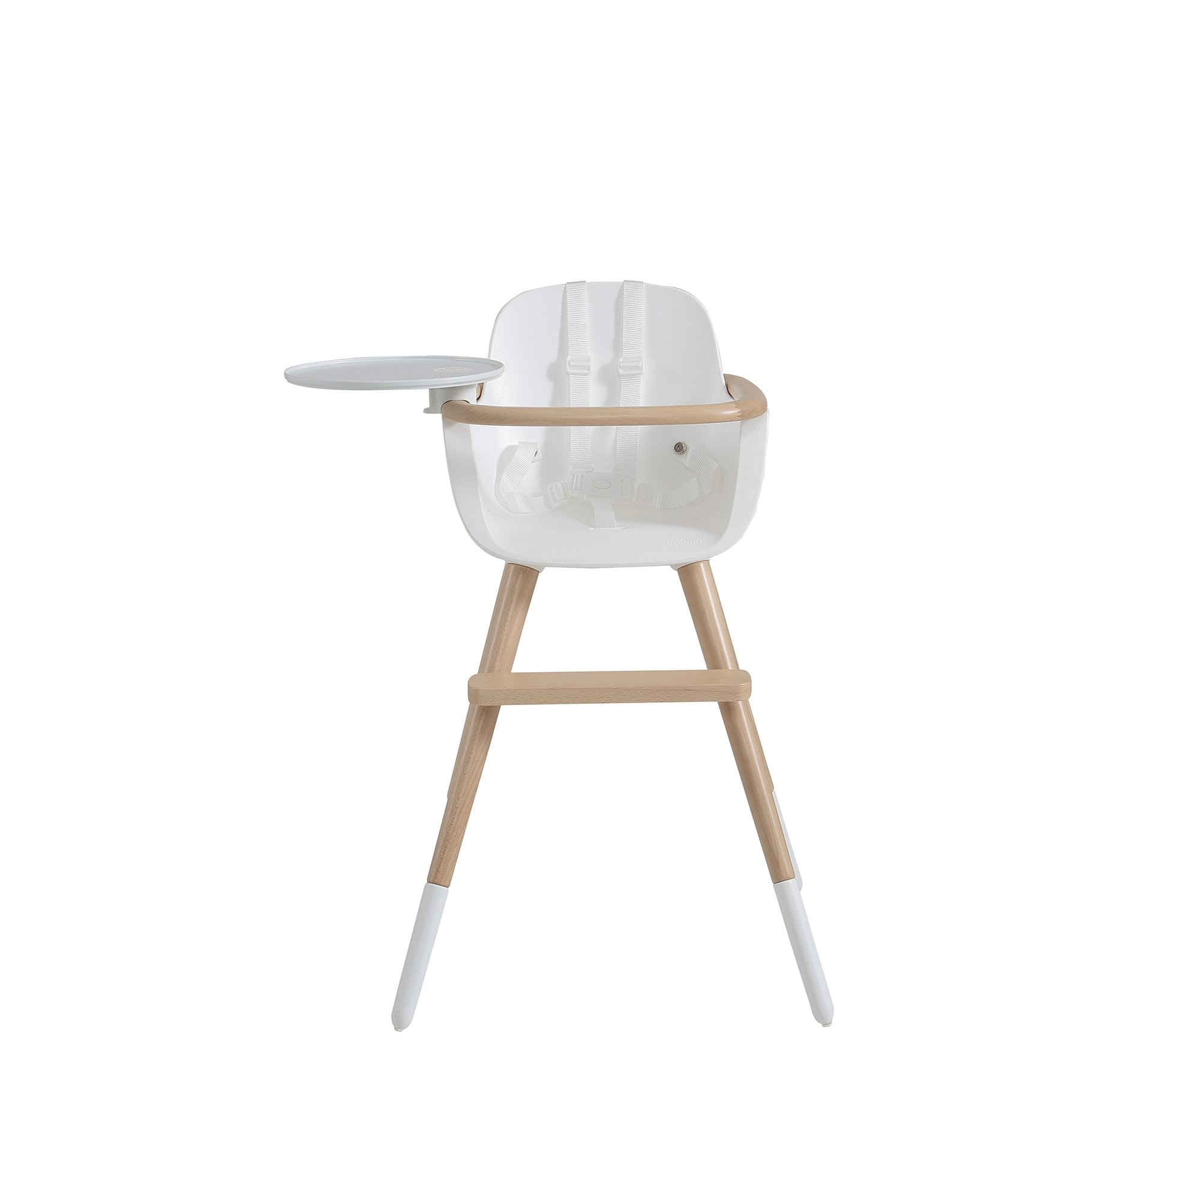 Micuna - Chaise haute Ovo Original One